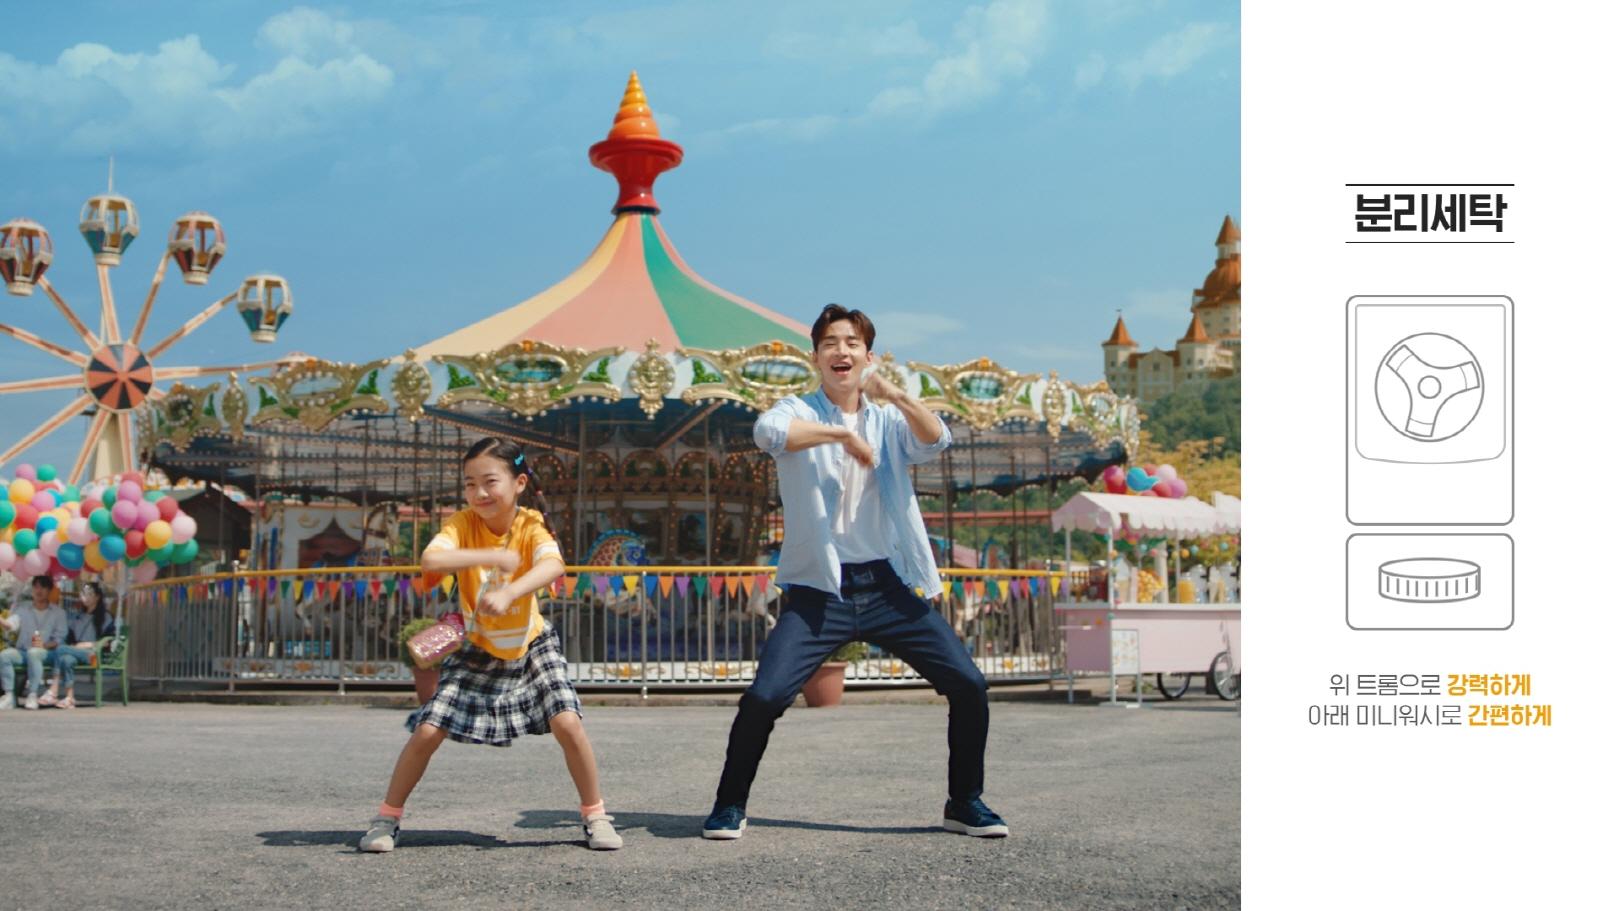 LG전자가 4일부터 30일까지 '트윈워시 댄스 챌린지(TWINWashTM Dance Challenge)'를 진행한다. 사진은 가수 겸 배우 헨리가 동시세탁, 분리세탁, 공간절약, 시간절약, 5방향 터보샷 등 트롬 트윈워시의 장점을 소개하는 트윈워시 댄스(https://www.twinwashevent.co.kr) 영상 캡쳐